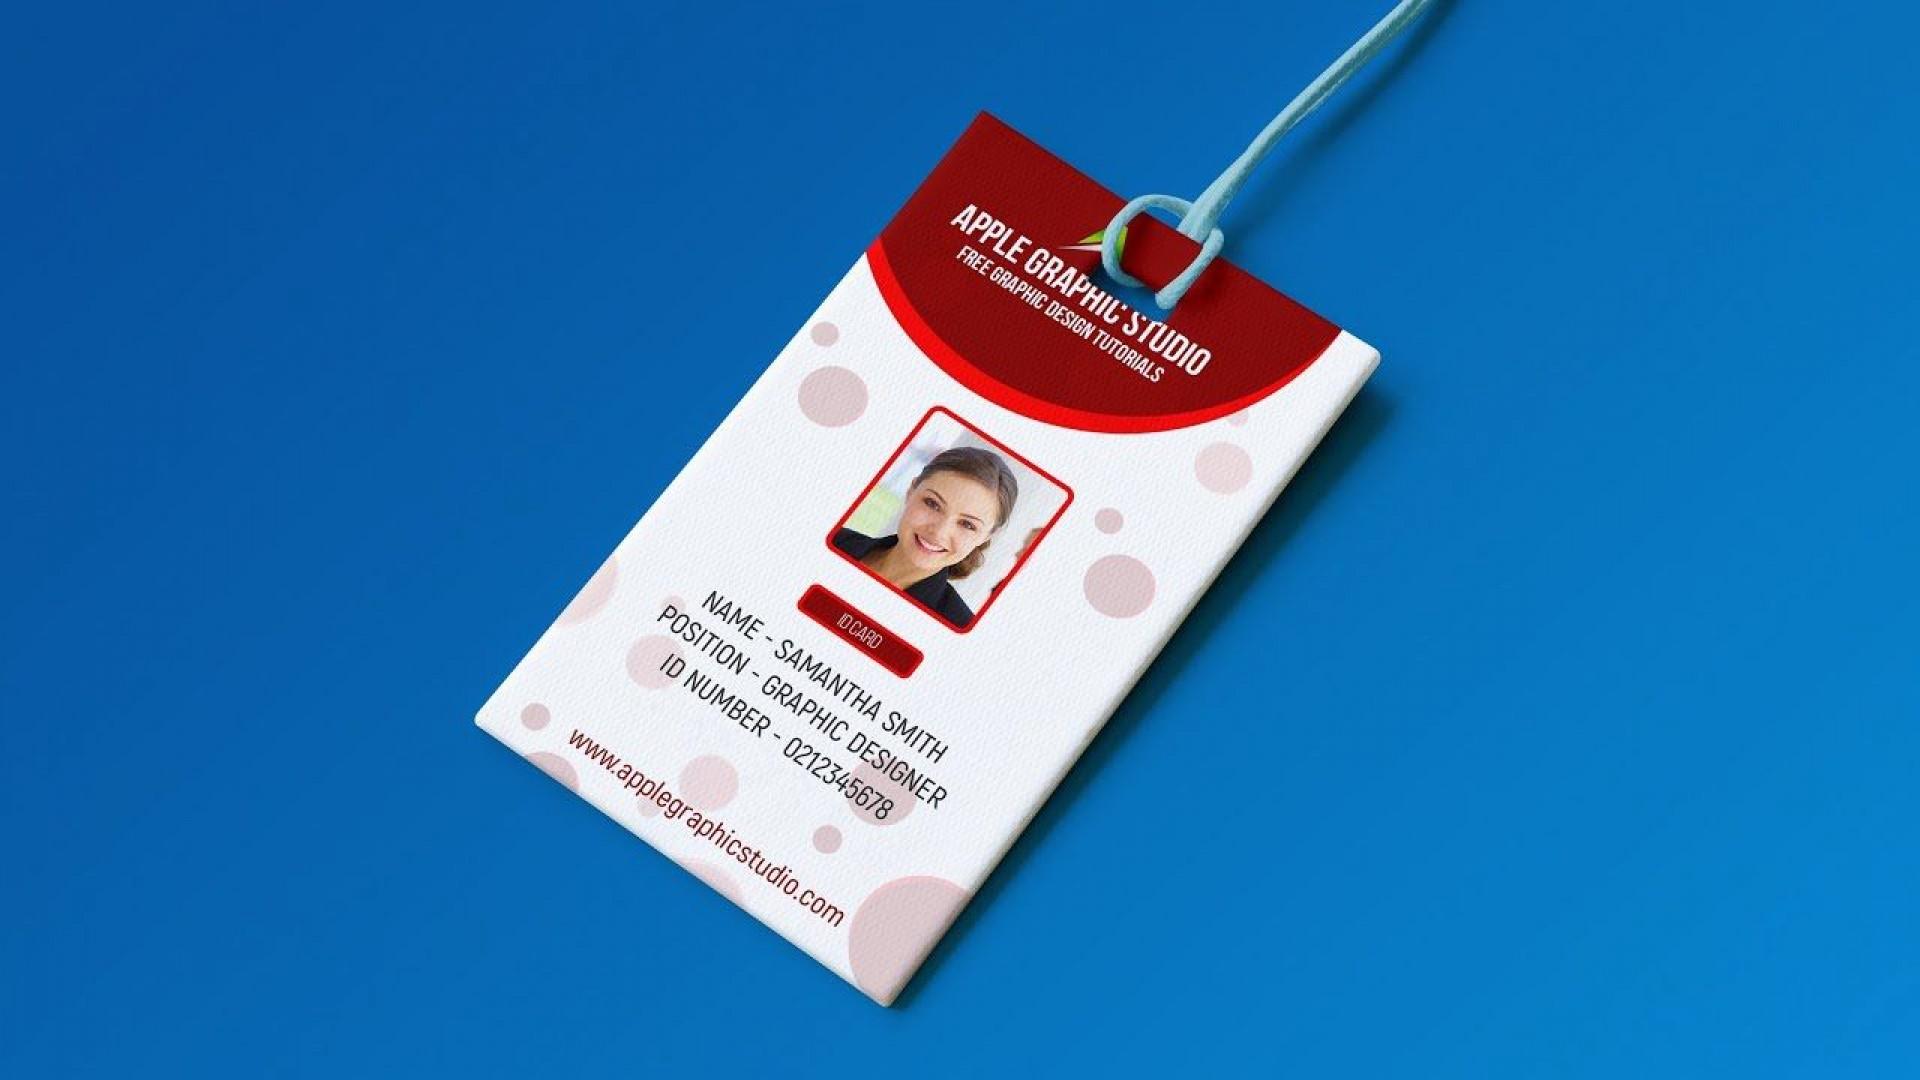 006 Wonderful Id Card Template Free Photo  Download Pdf Design1920